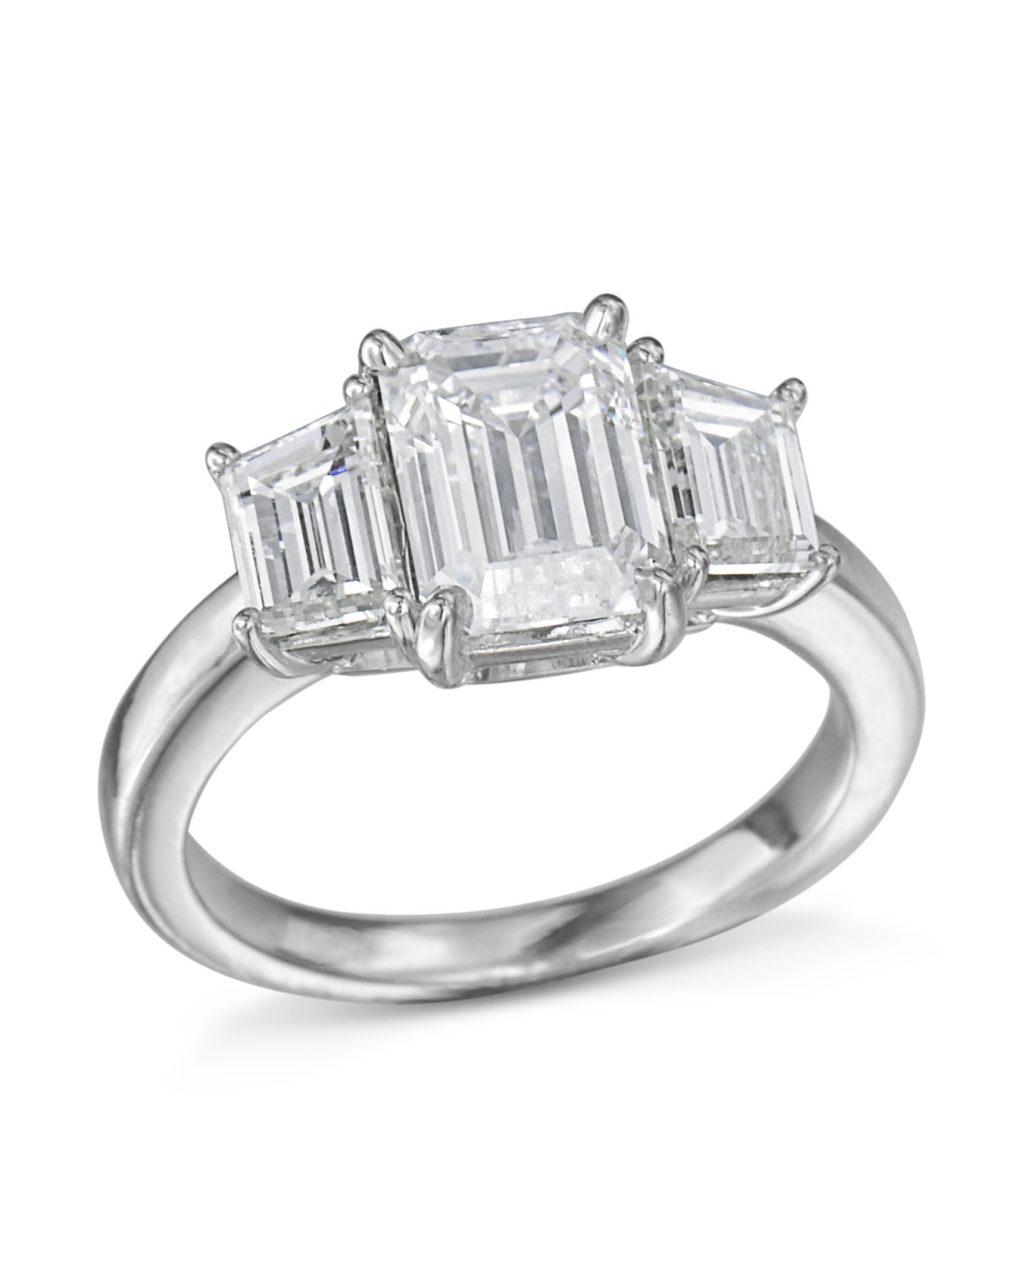 Three Stone Emerald Cut Diamond Ring – Turgeon Raine Within Emerald And Diamond Three Stone Rings (View 25 of 25)